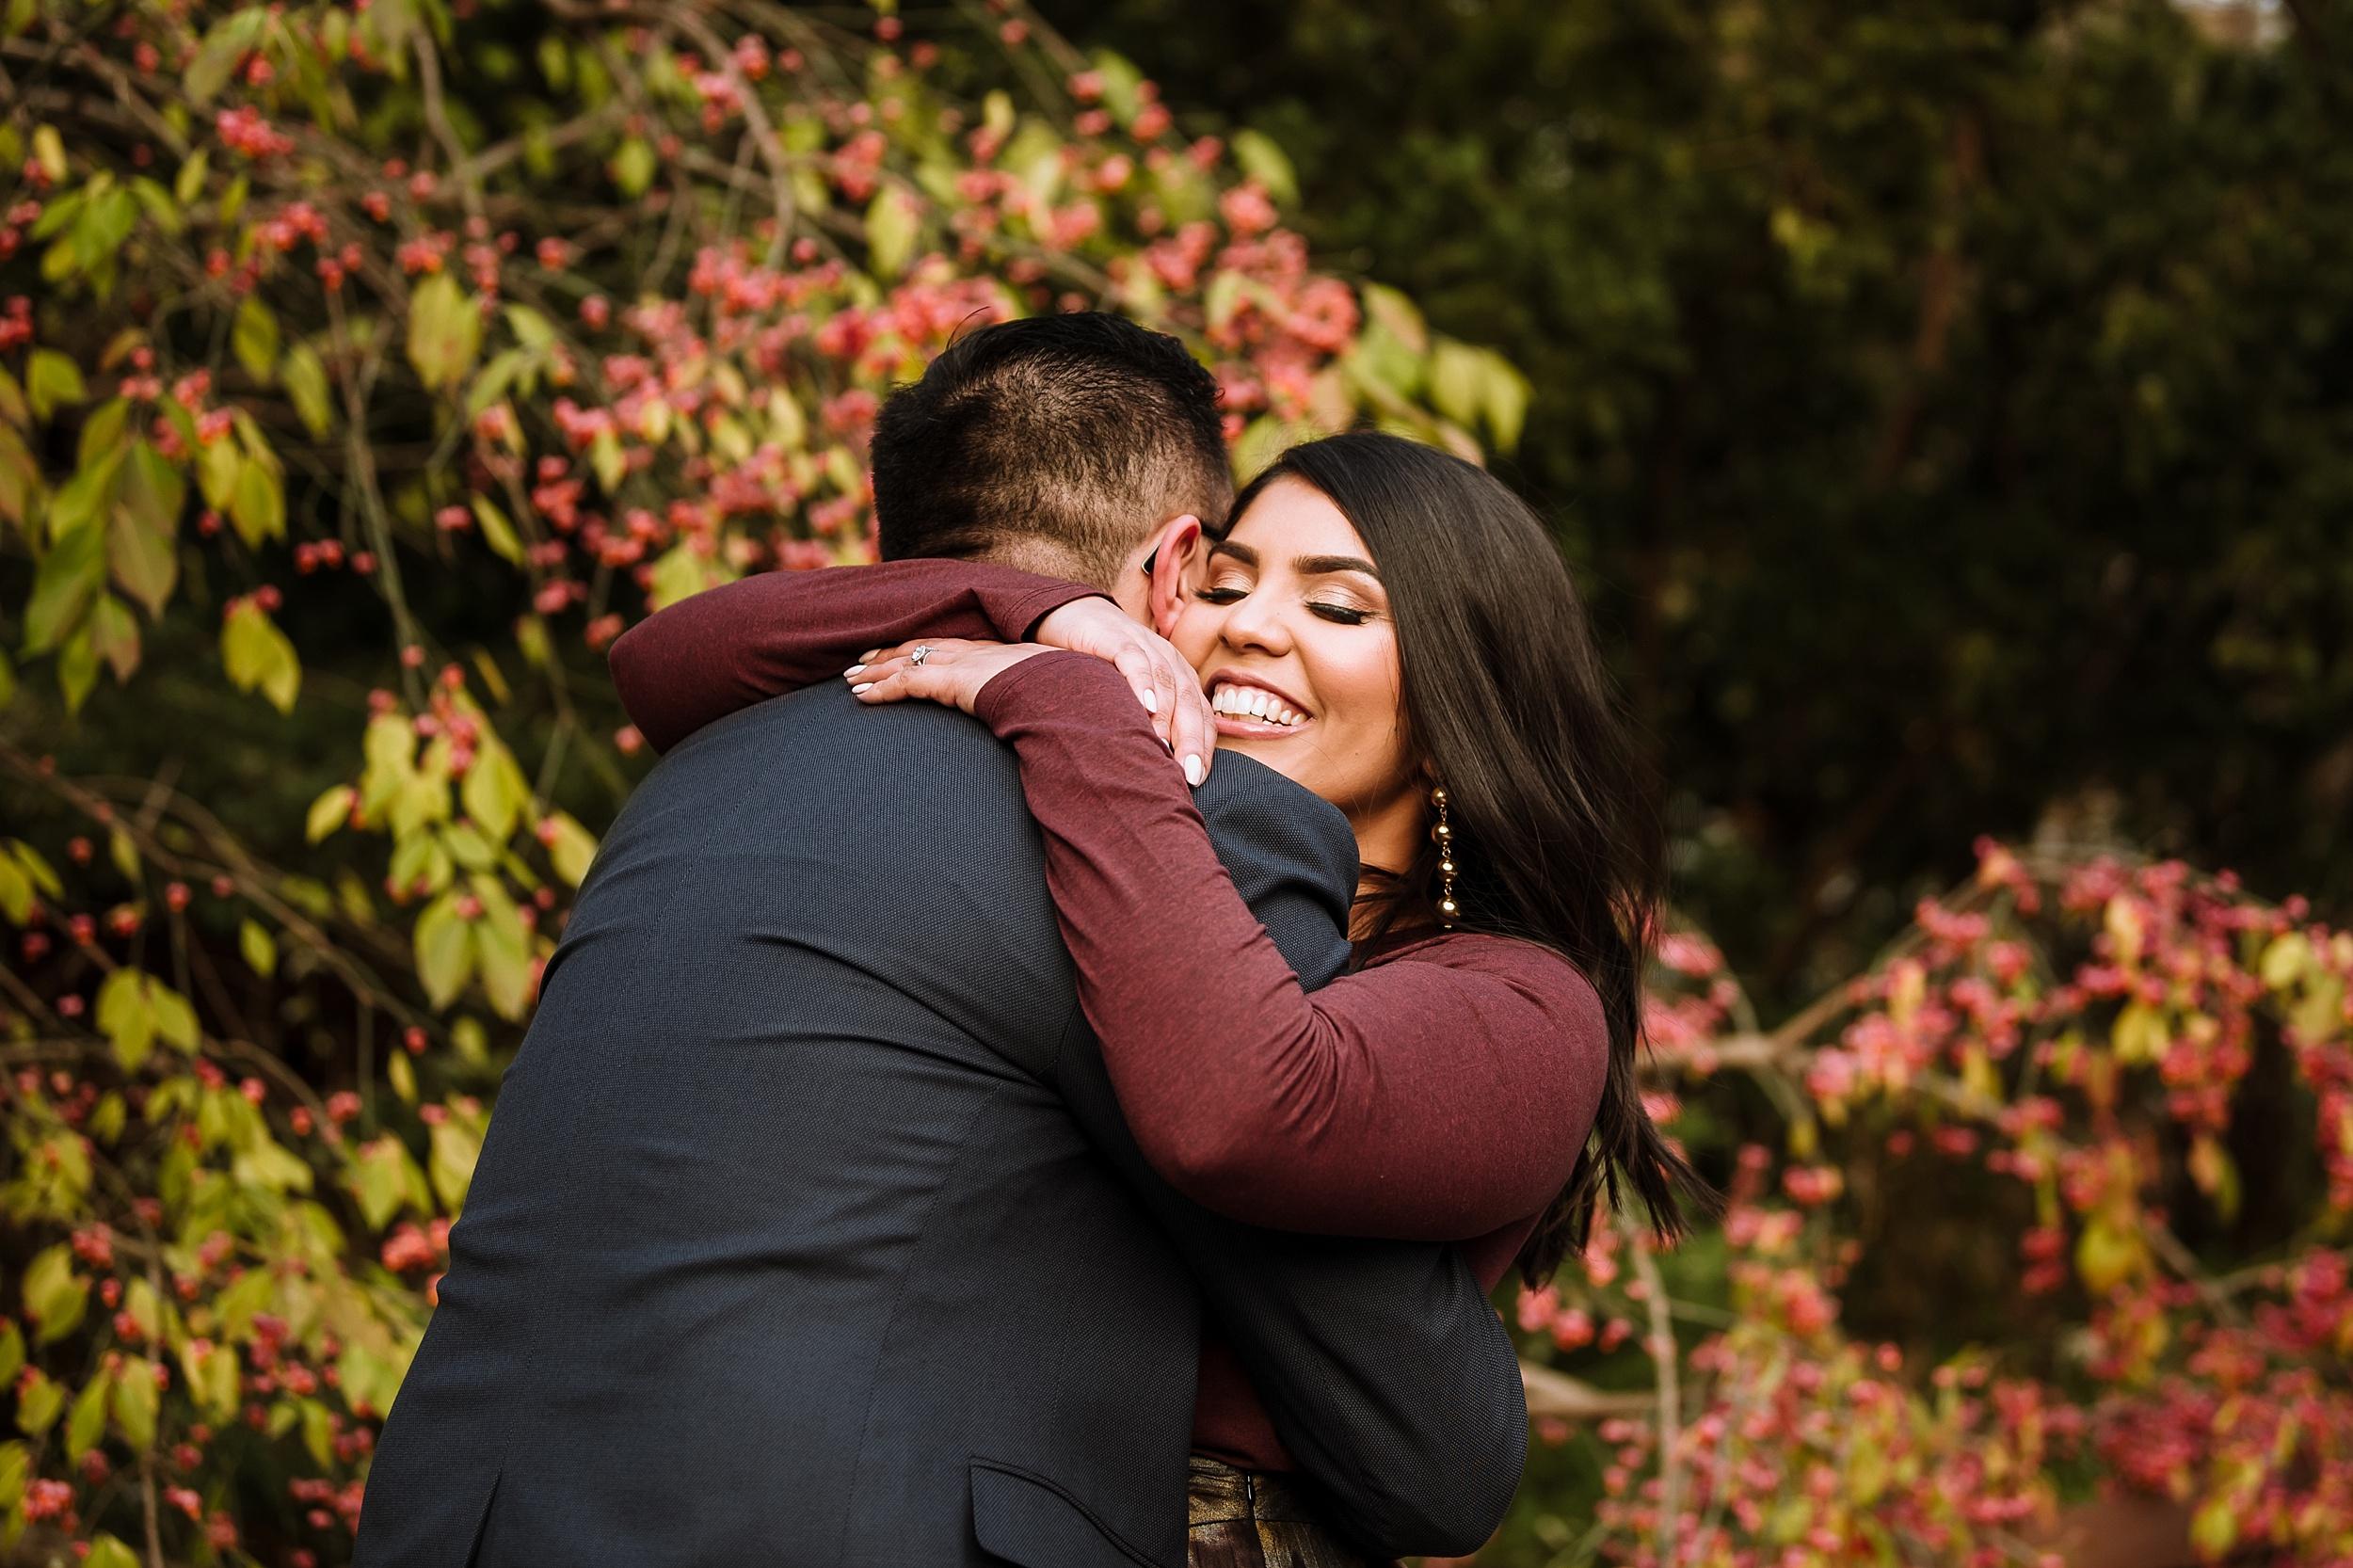 Alexander_Muir_Memorial_Gardens_Engagement_Shoot_Toronto_Wedding_Photographer_0019.jpg